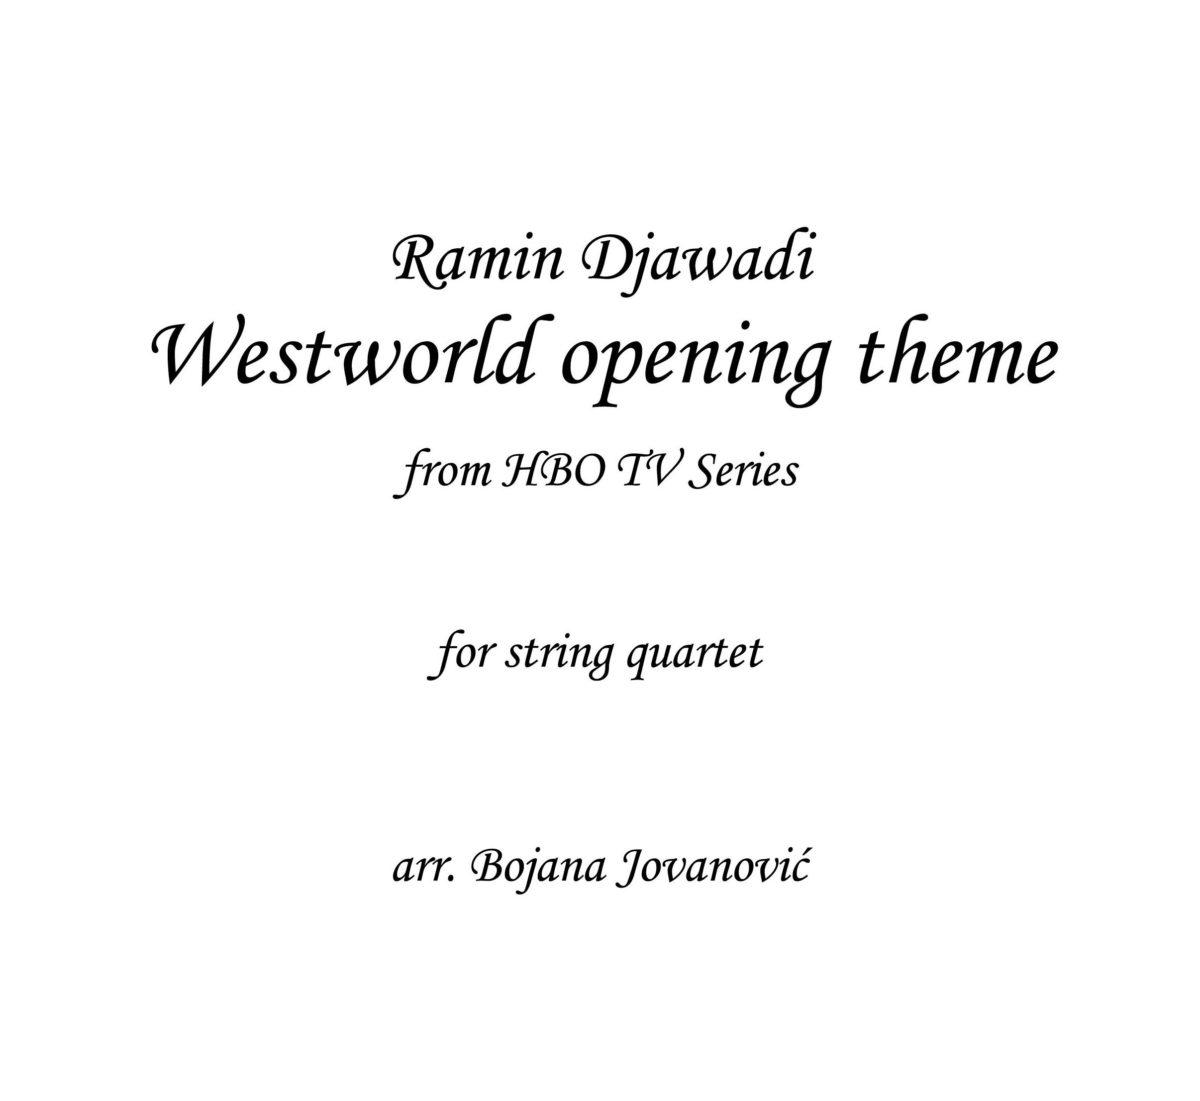 Westworld opening theme - Sheet Music